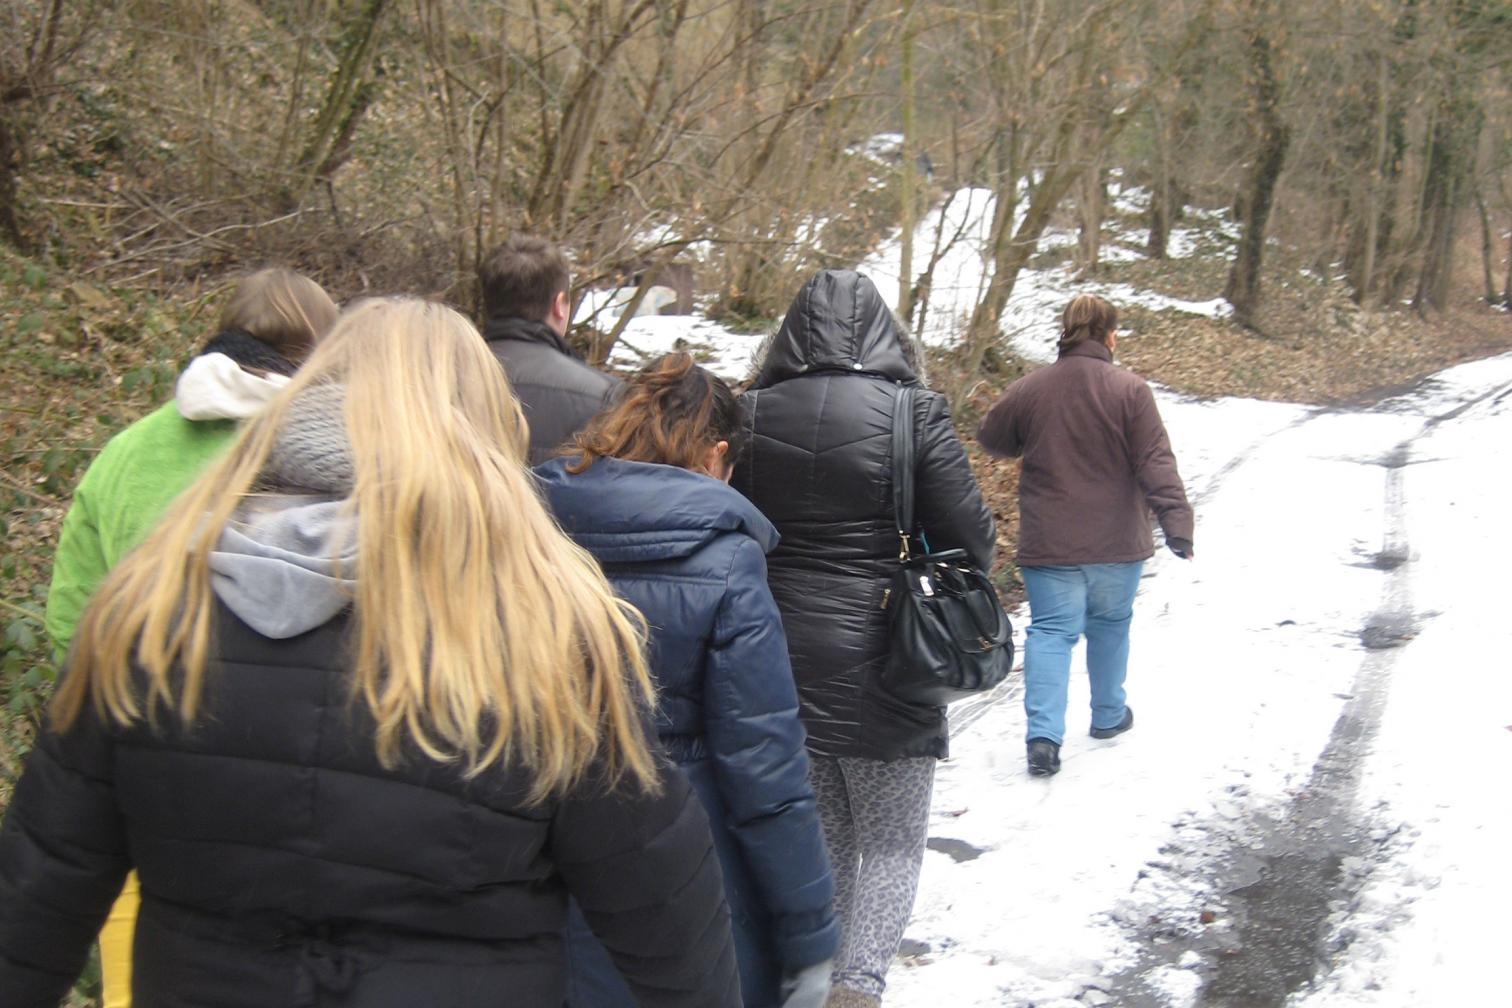 Gruppe wandert im Wald im Schnee